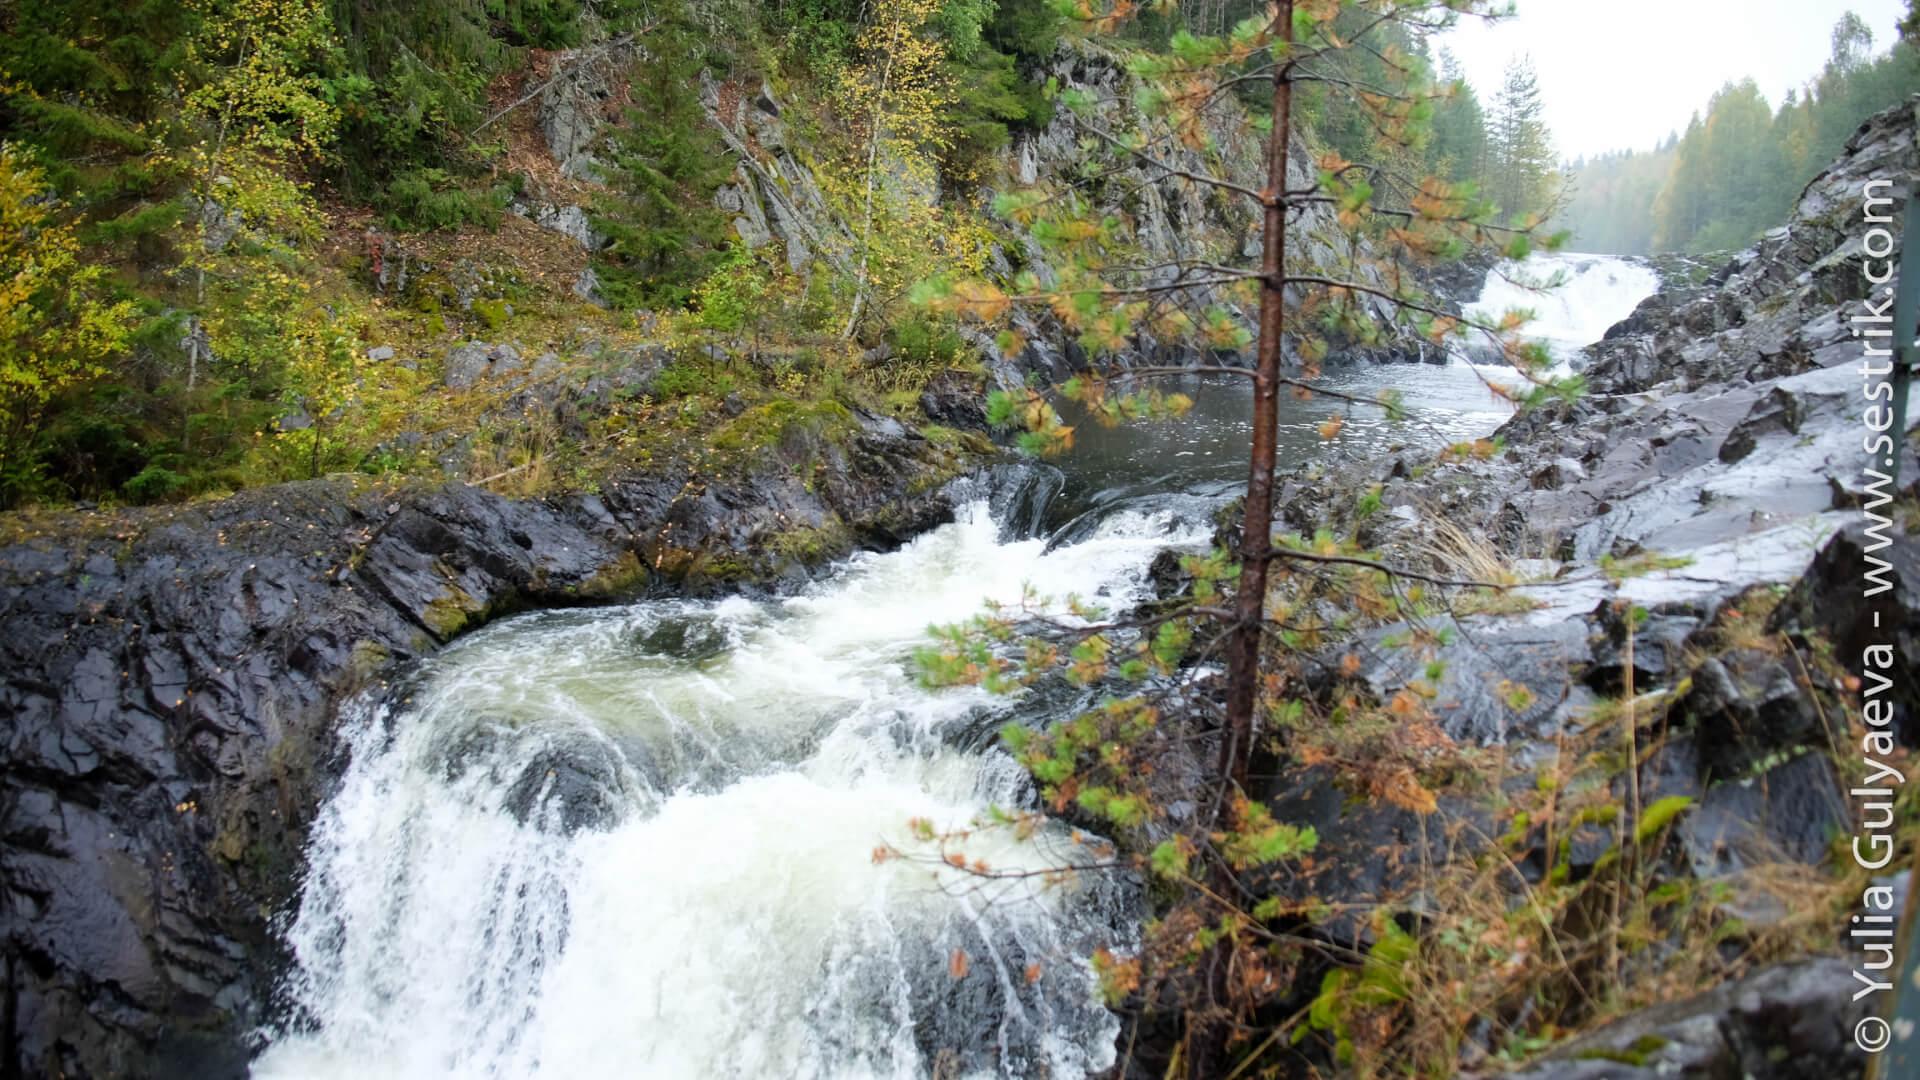 водопад кивач в заповеднике кивач